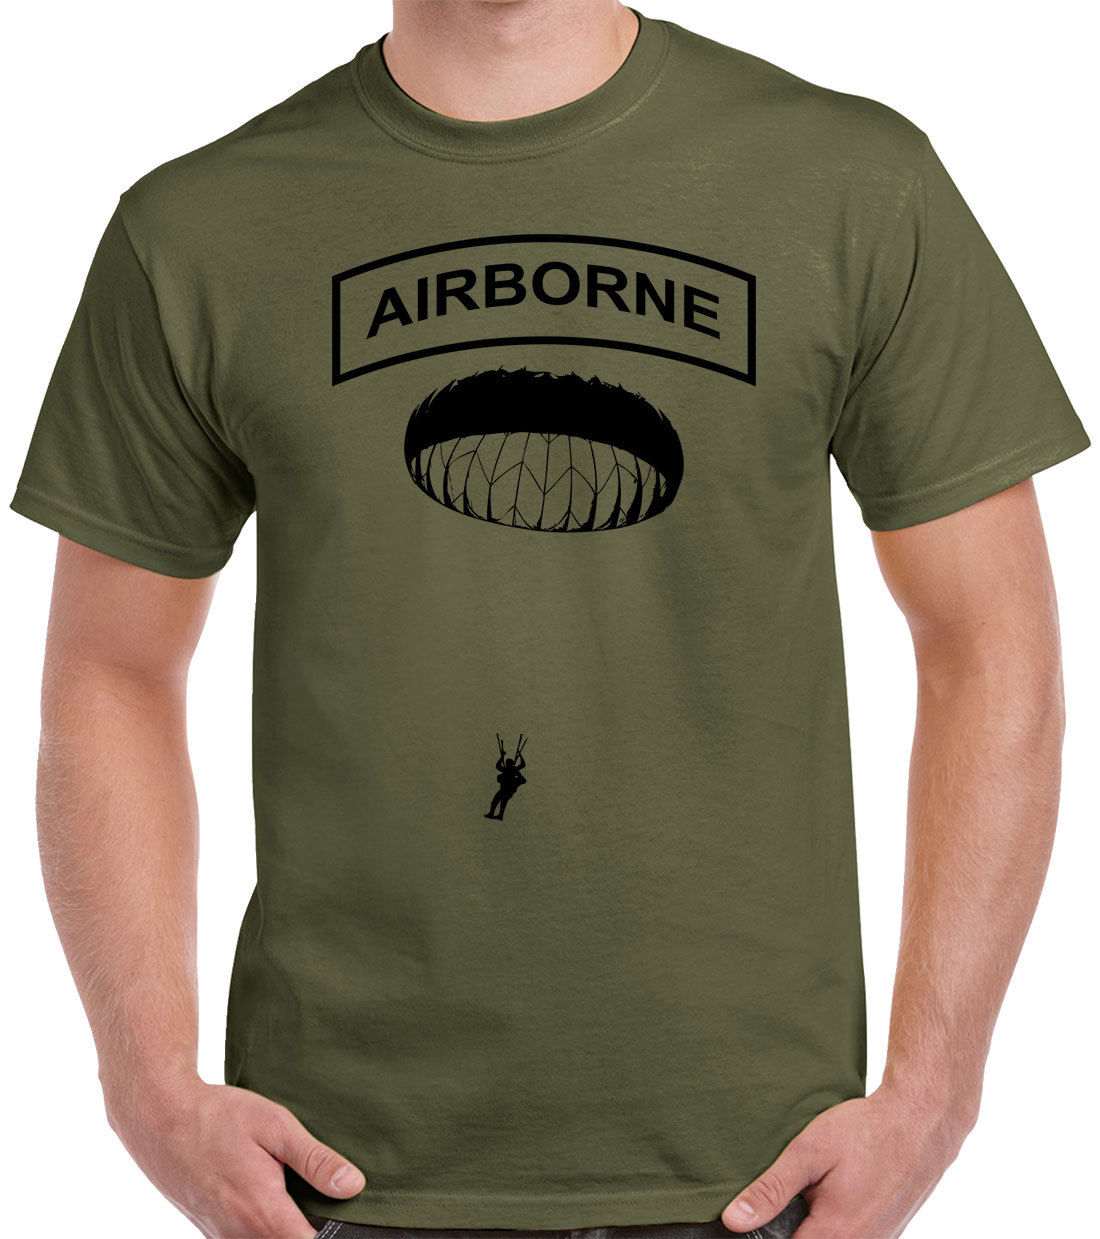 Airborne T-Shirt Black Ink Paratrooper 82nd Fashion Casual Print T Shirt Human Race Hip Hop Clothing Cotton Short Sleeve T Shirt